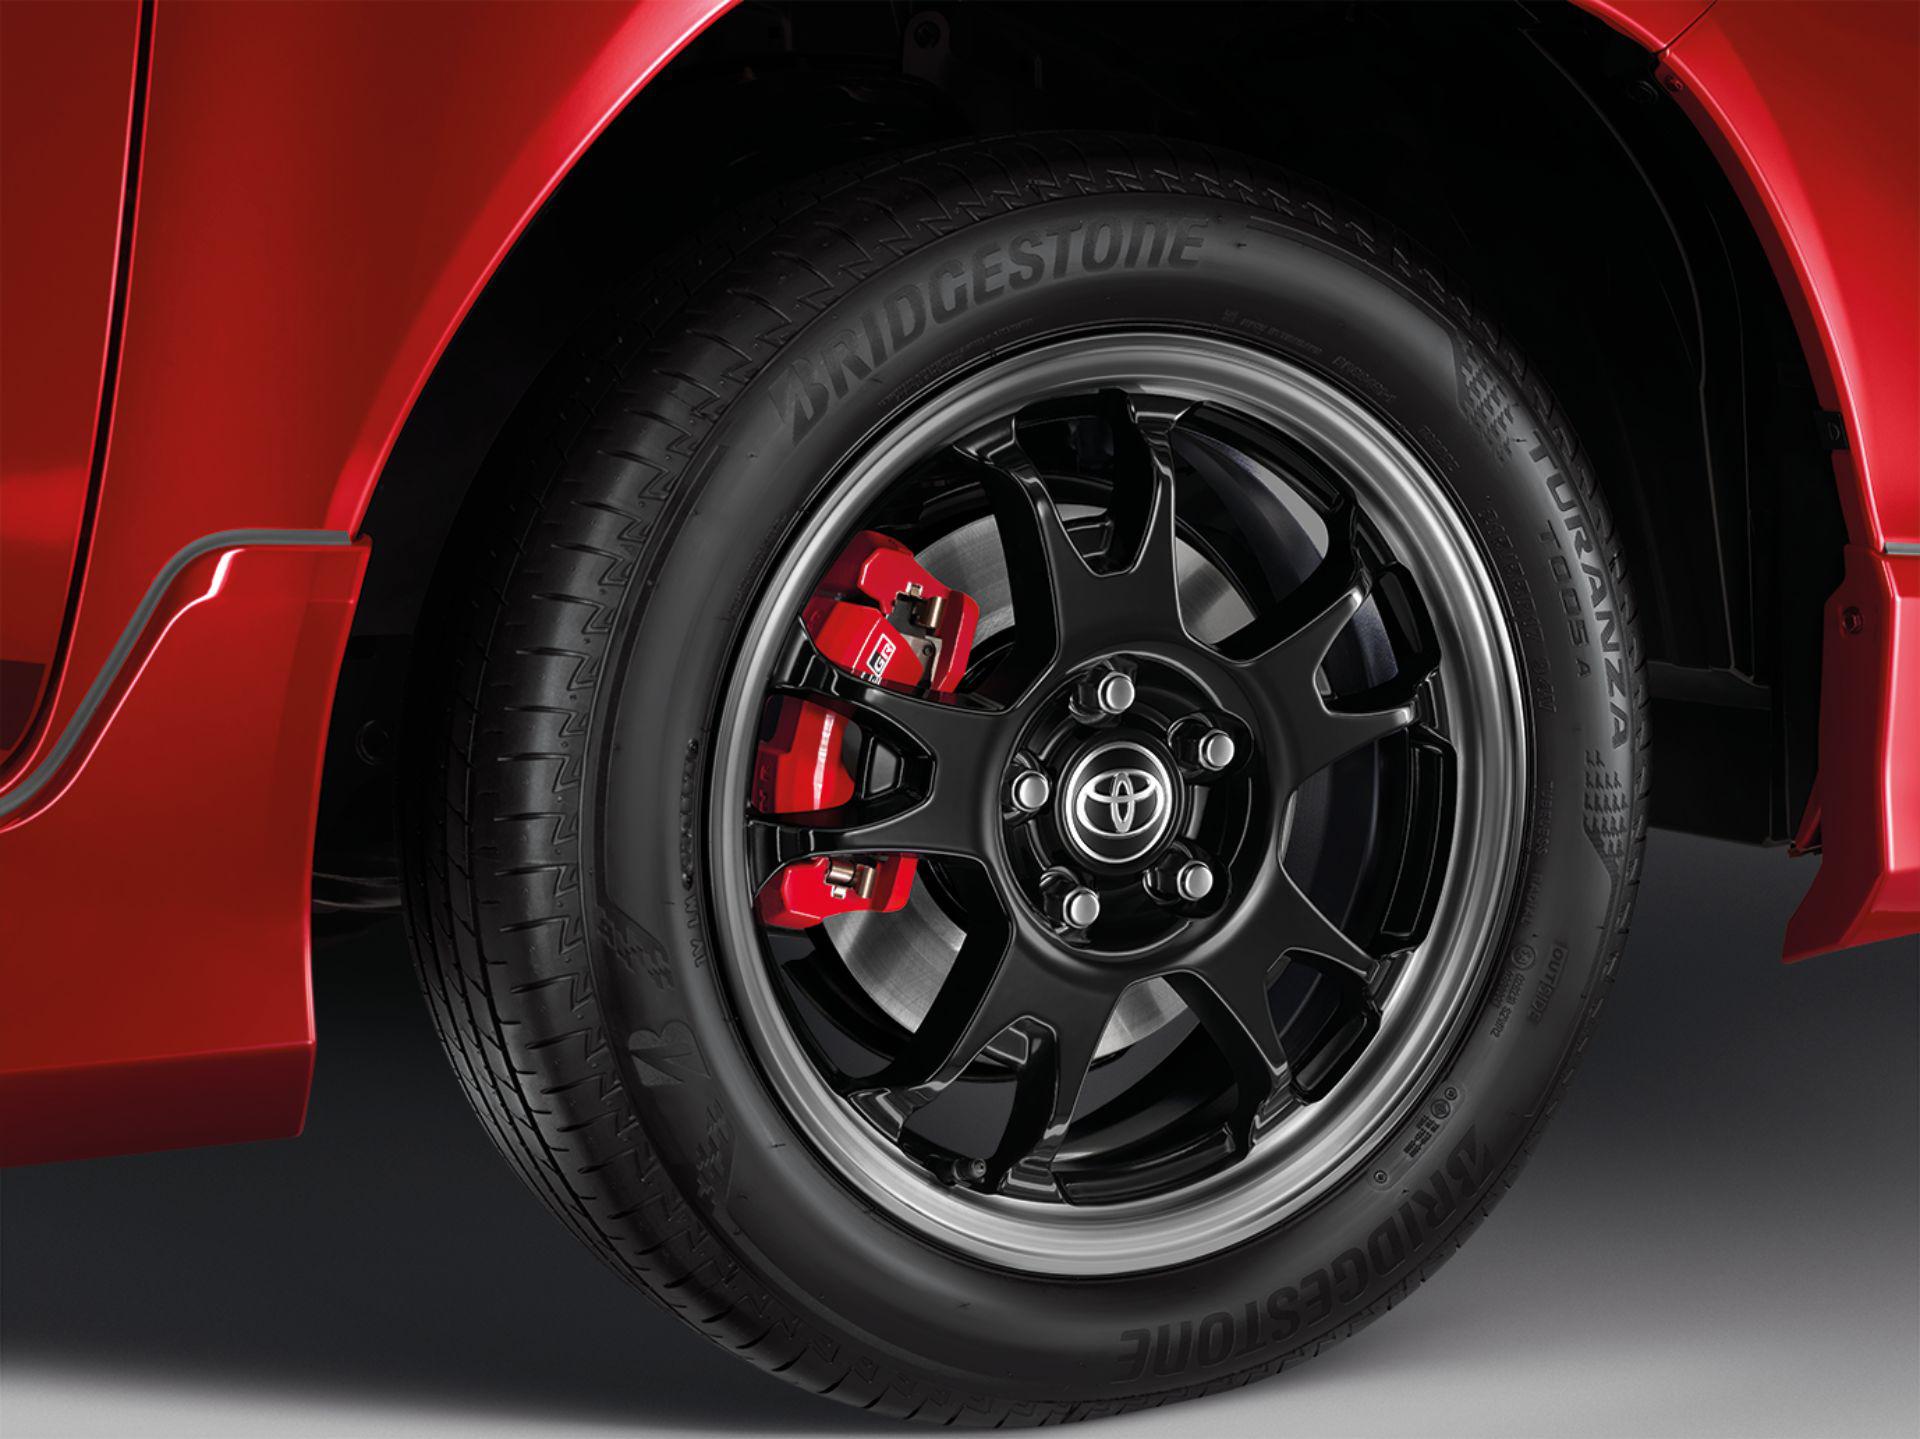 Roda da Toyota Hilux Revo GR Sport vermelha